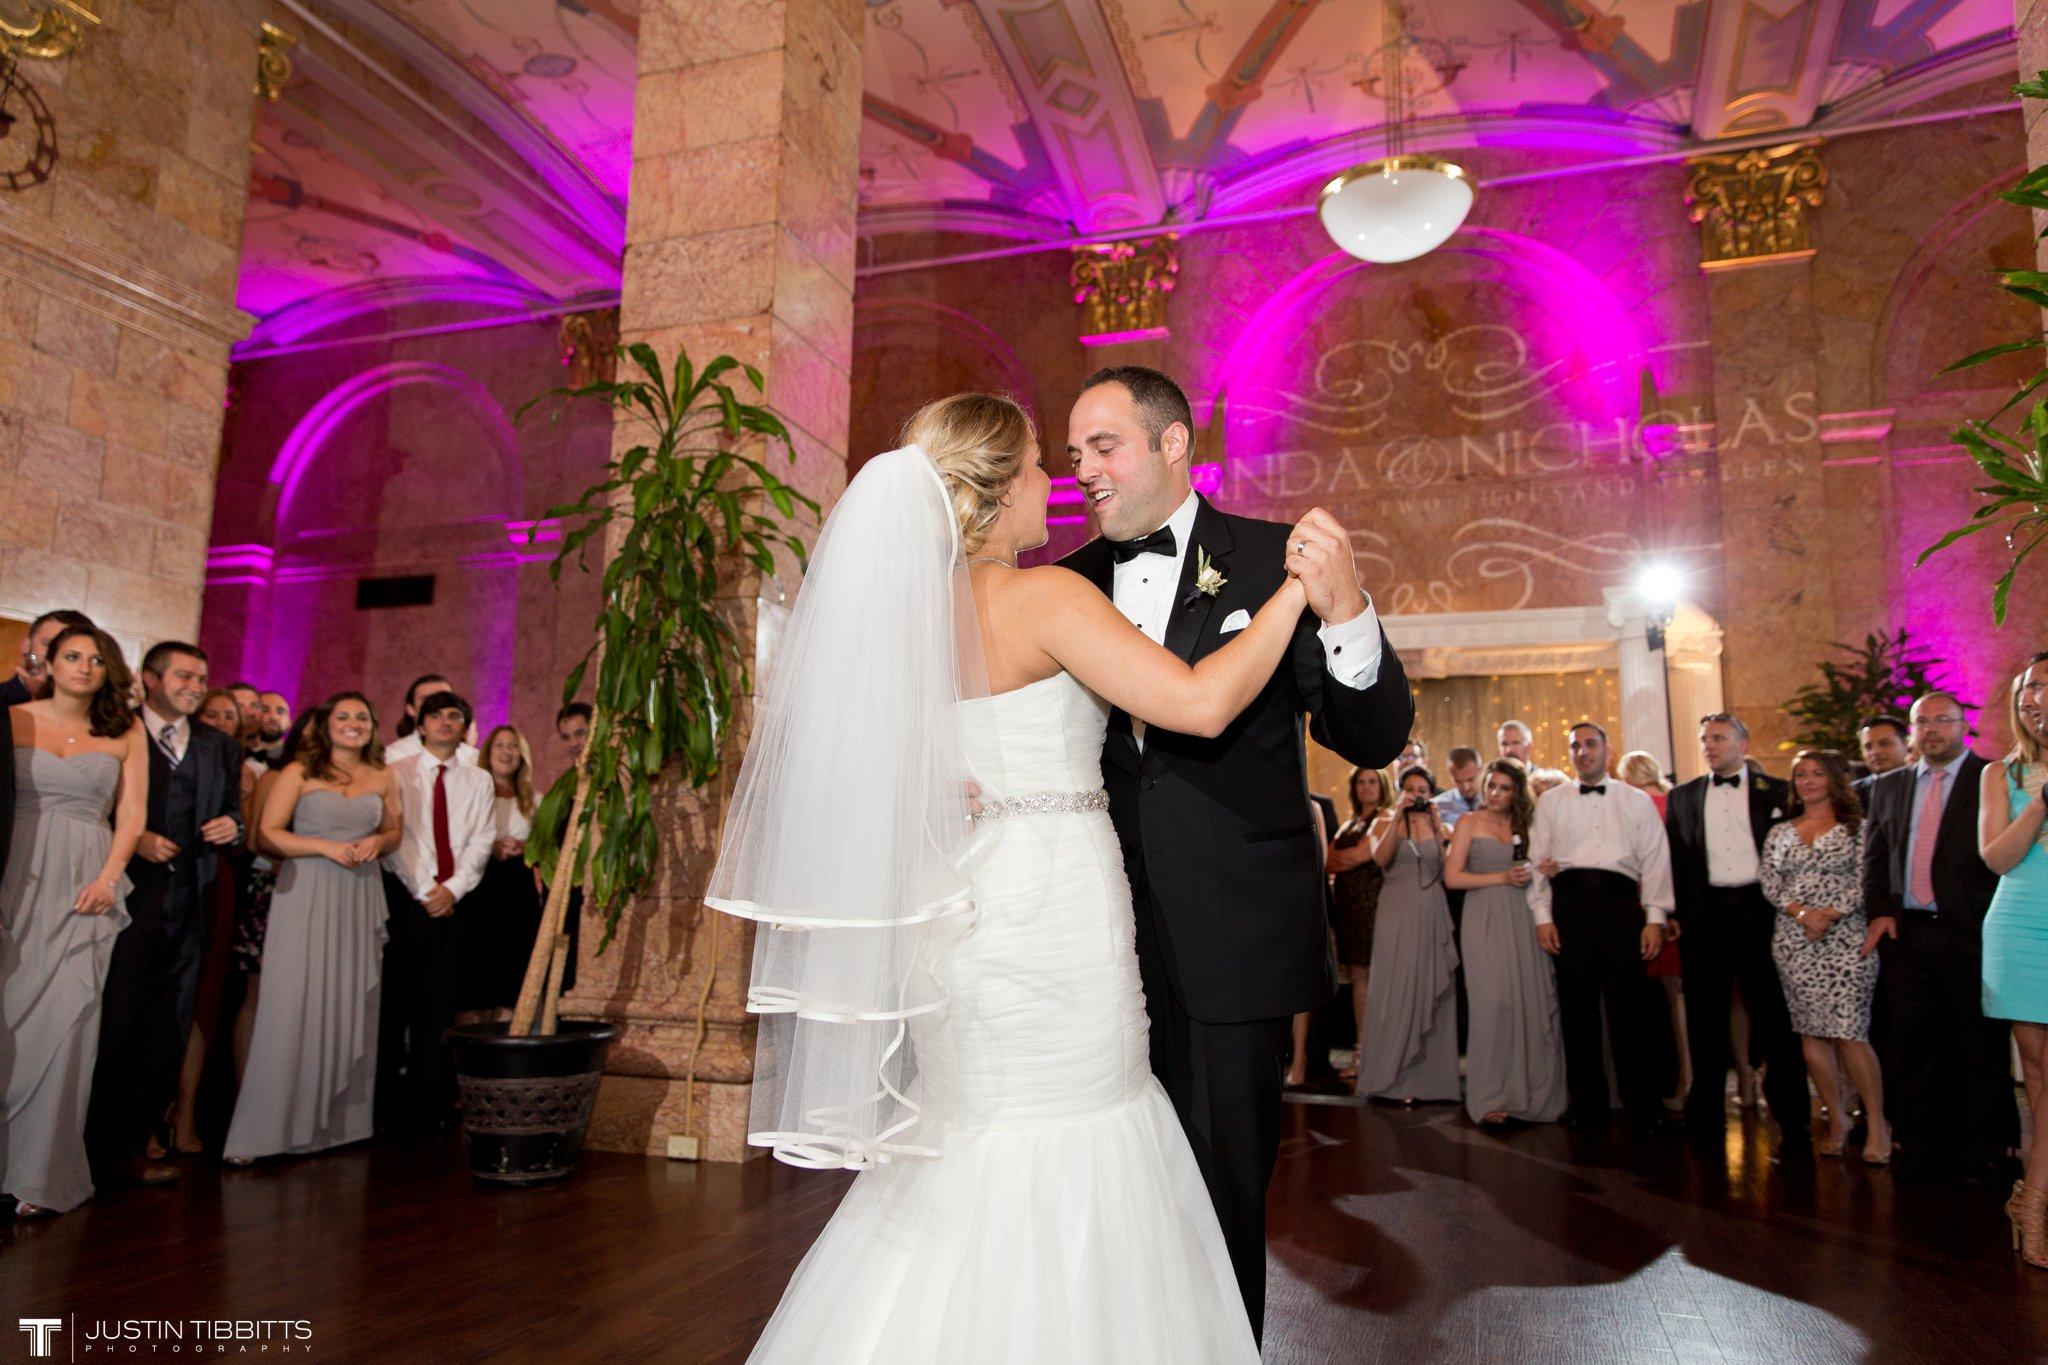 state-room-wedding-photos-with-amanda-and-nick_0158